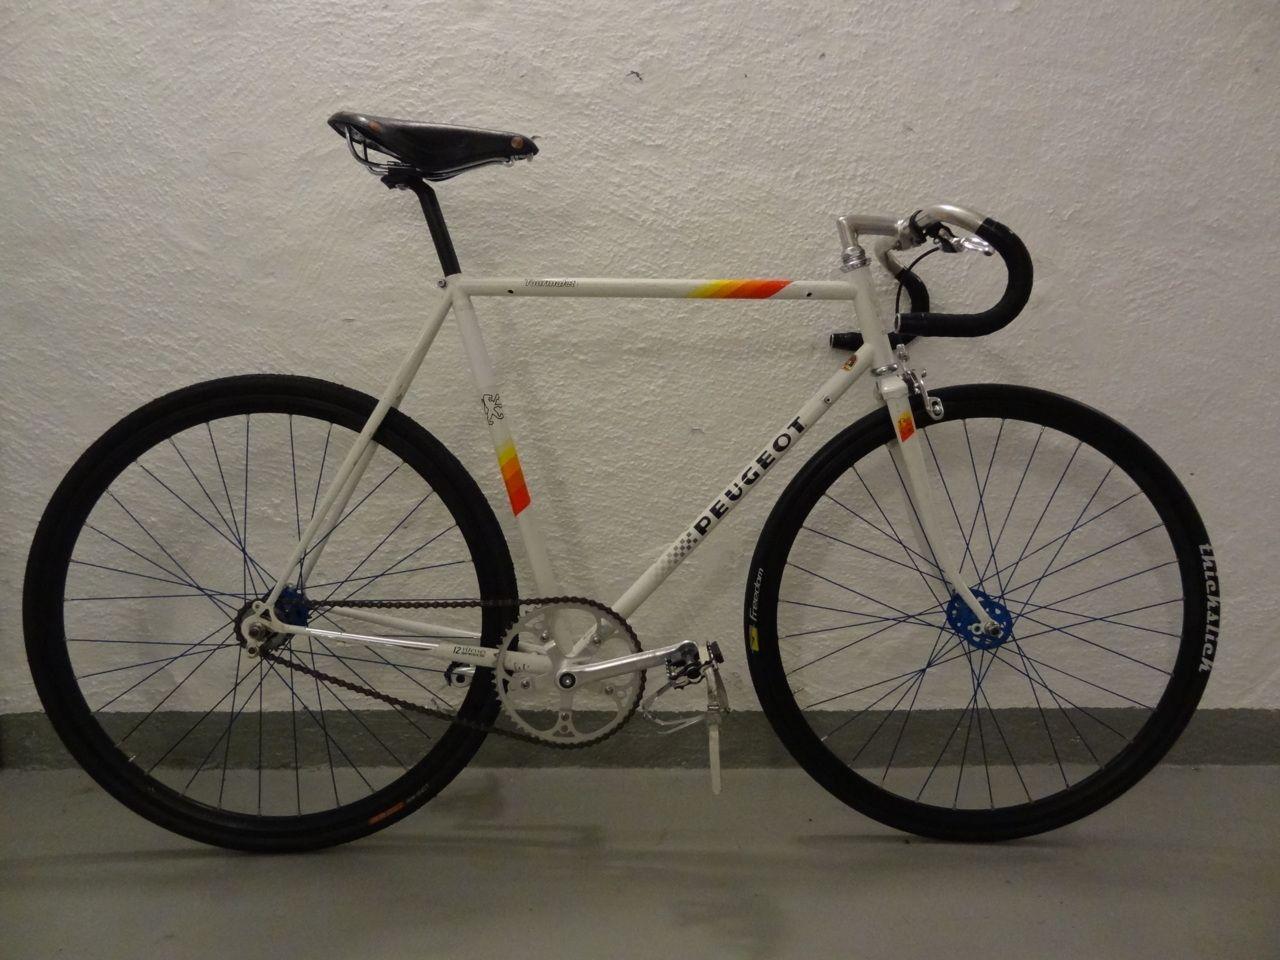 peugeot fixie fixies fixie bicycle bike. Black Bedroom Furniture Sets. Home Design Ideas